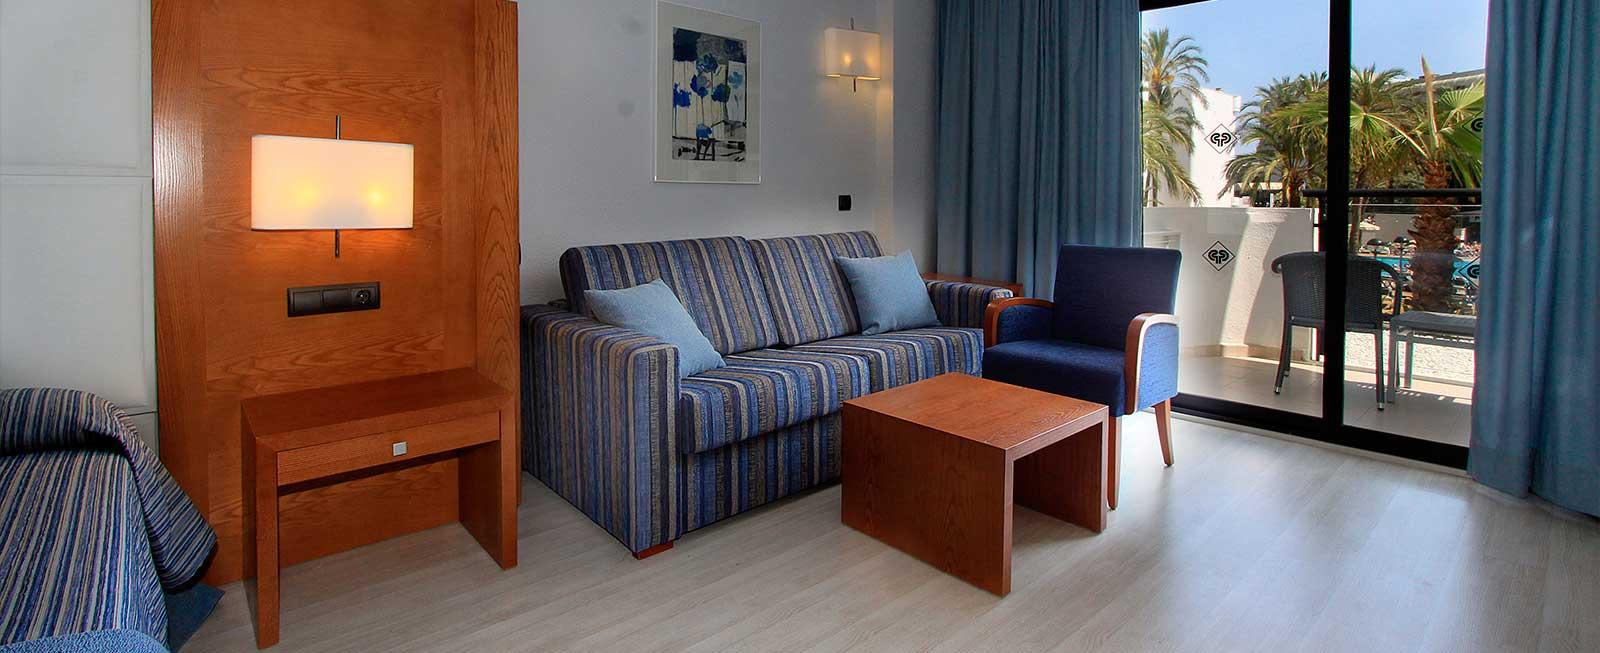 Apartamento Protur plameras Playa Aparthotel